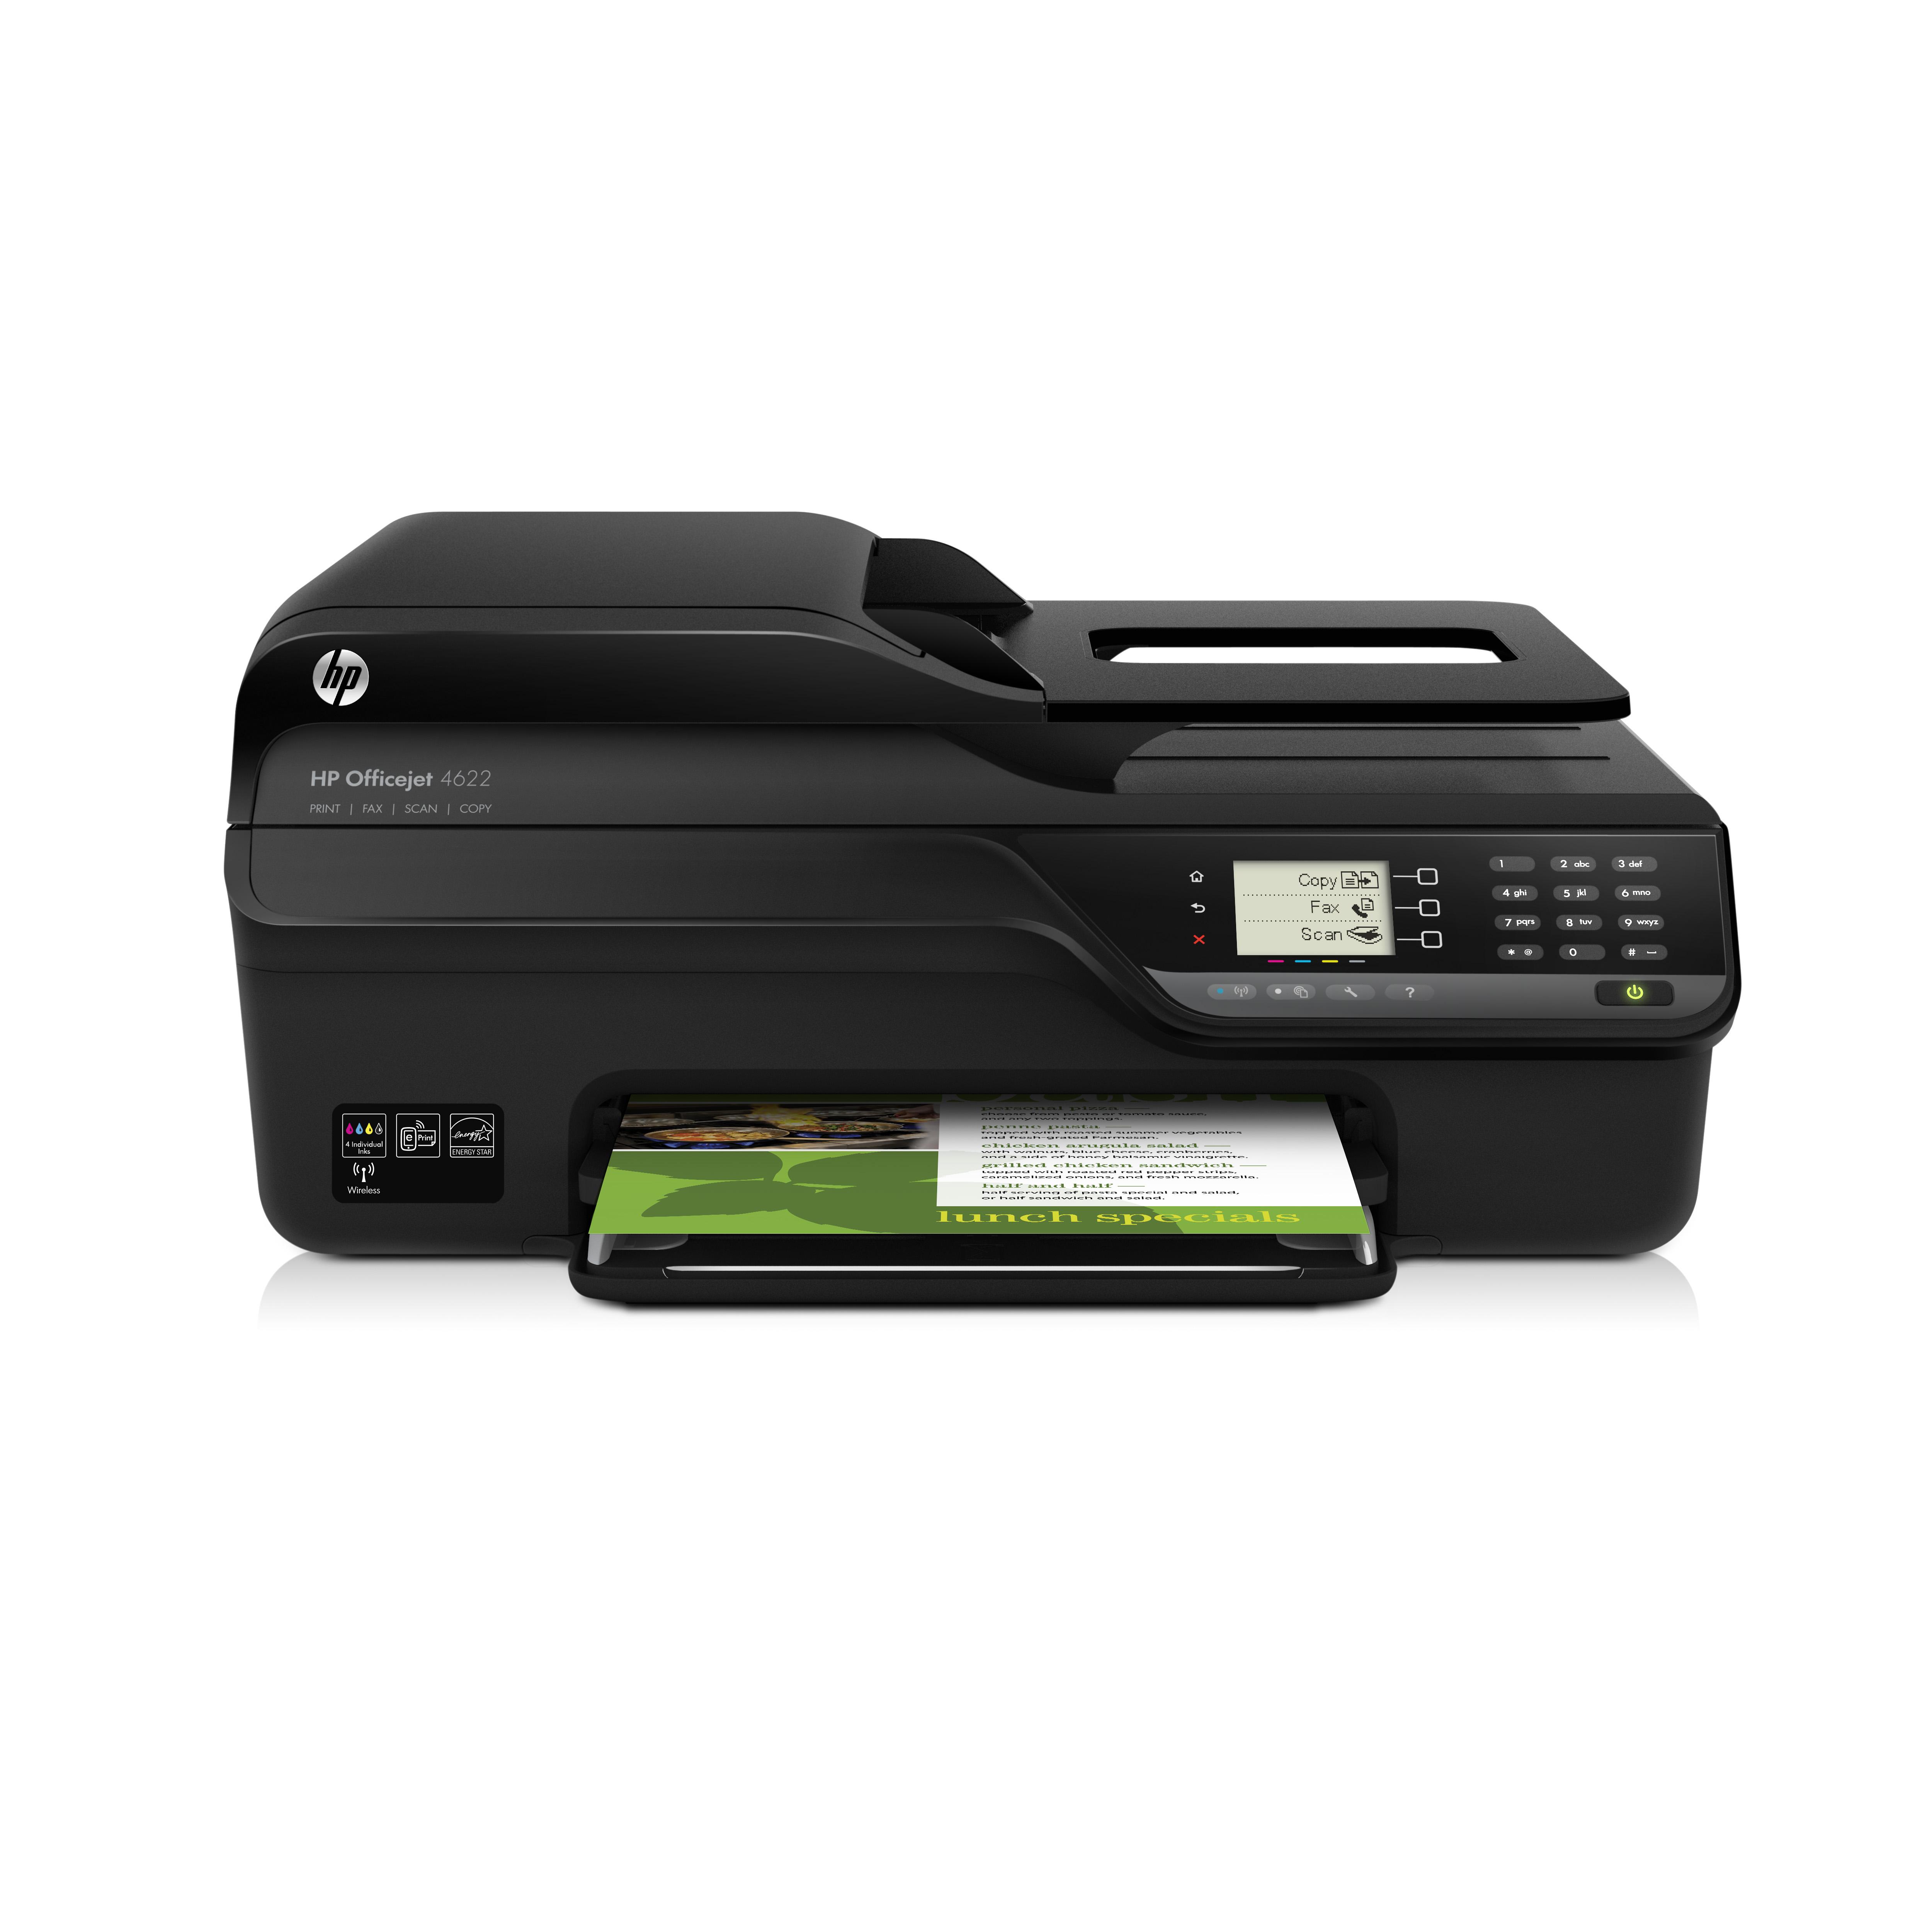 Máy in phun màu HP Officejet 4622( In -Scan- Fax-Foto) giá rẻ